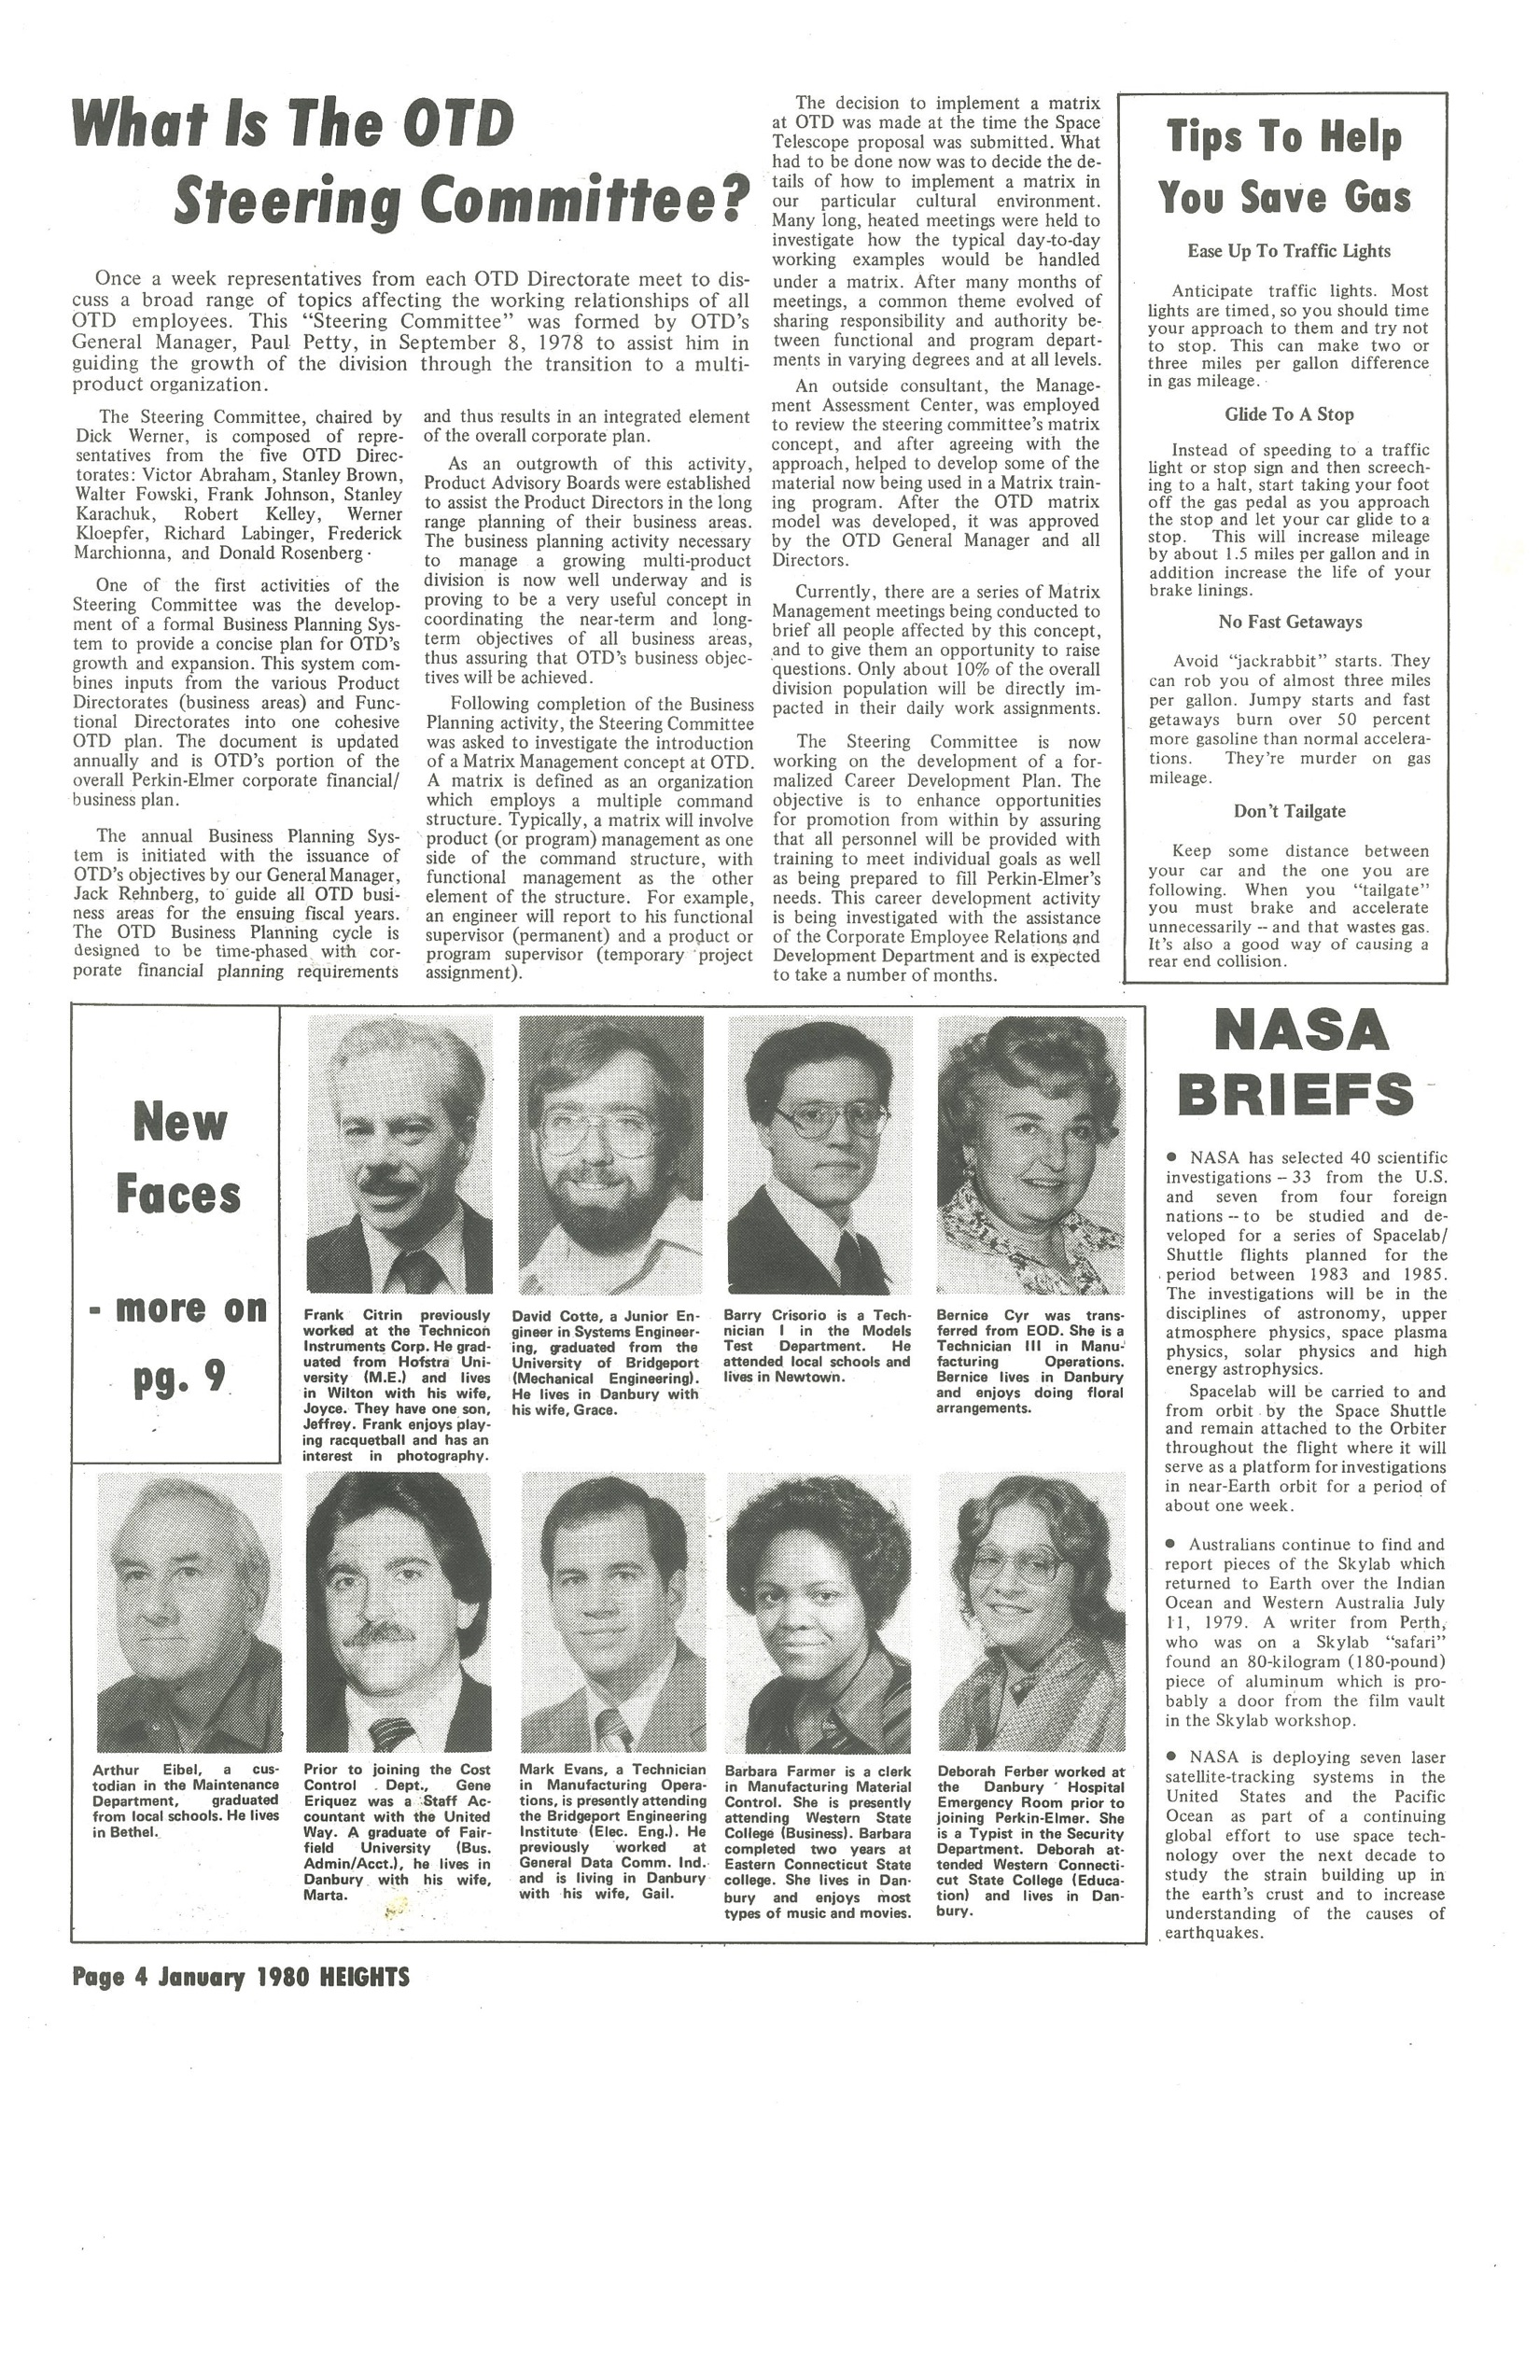 vol 13 num 4, page 4.jpg